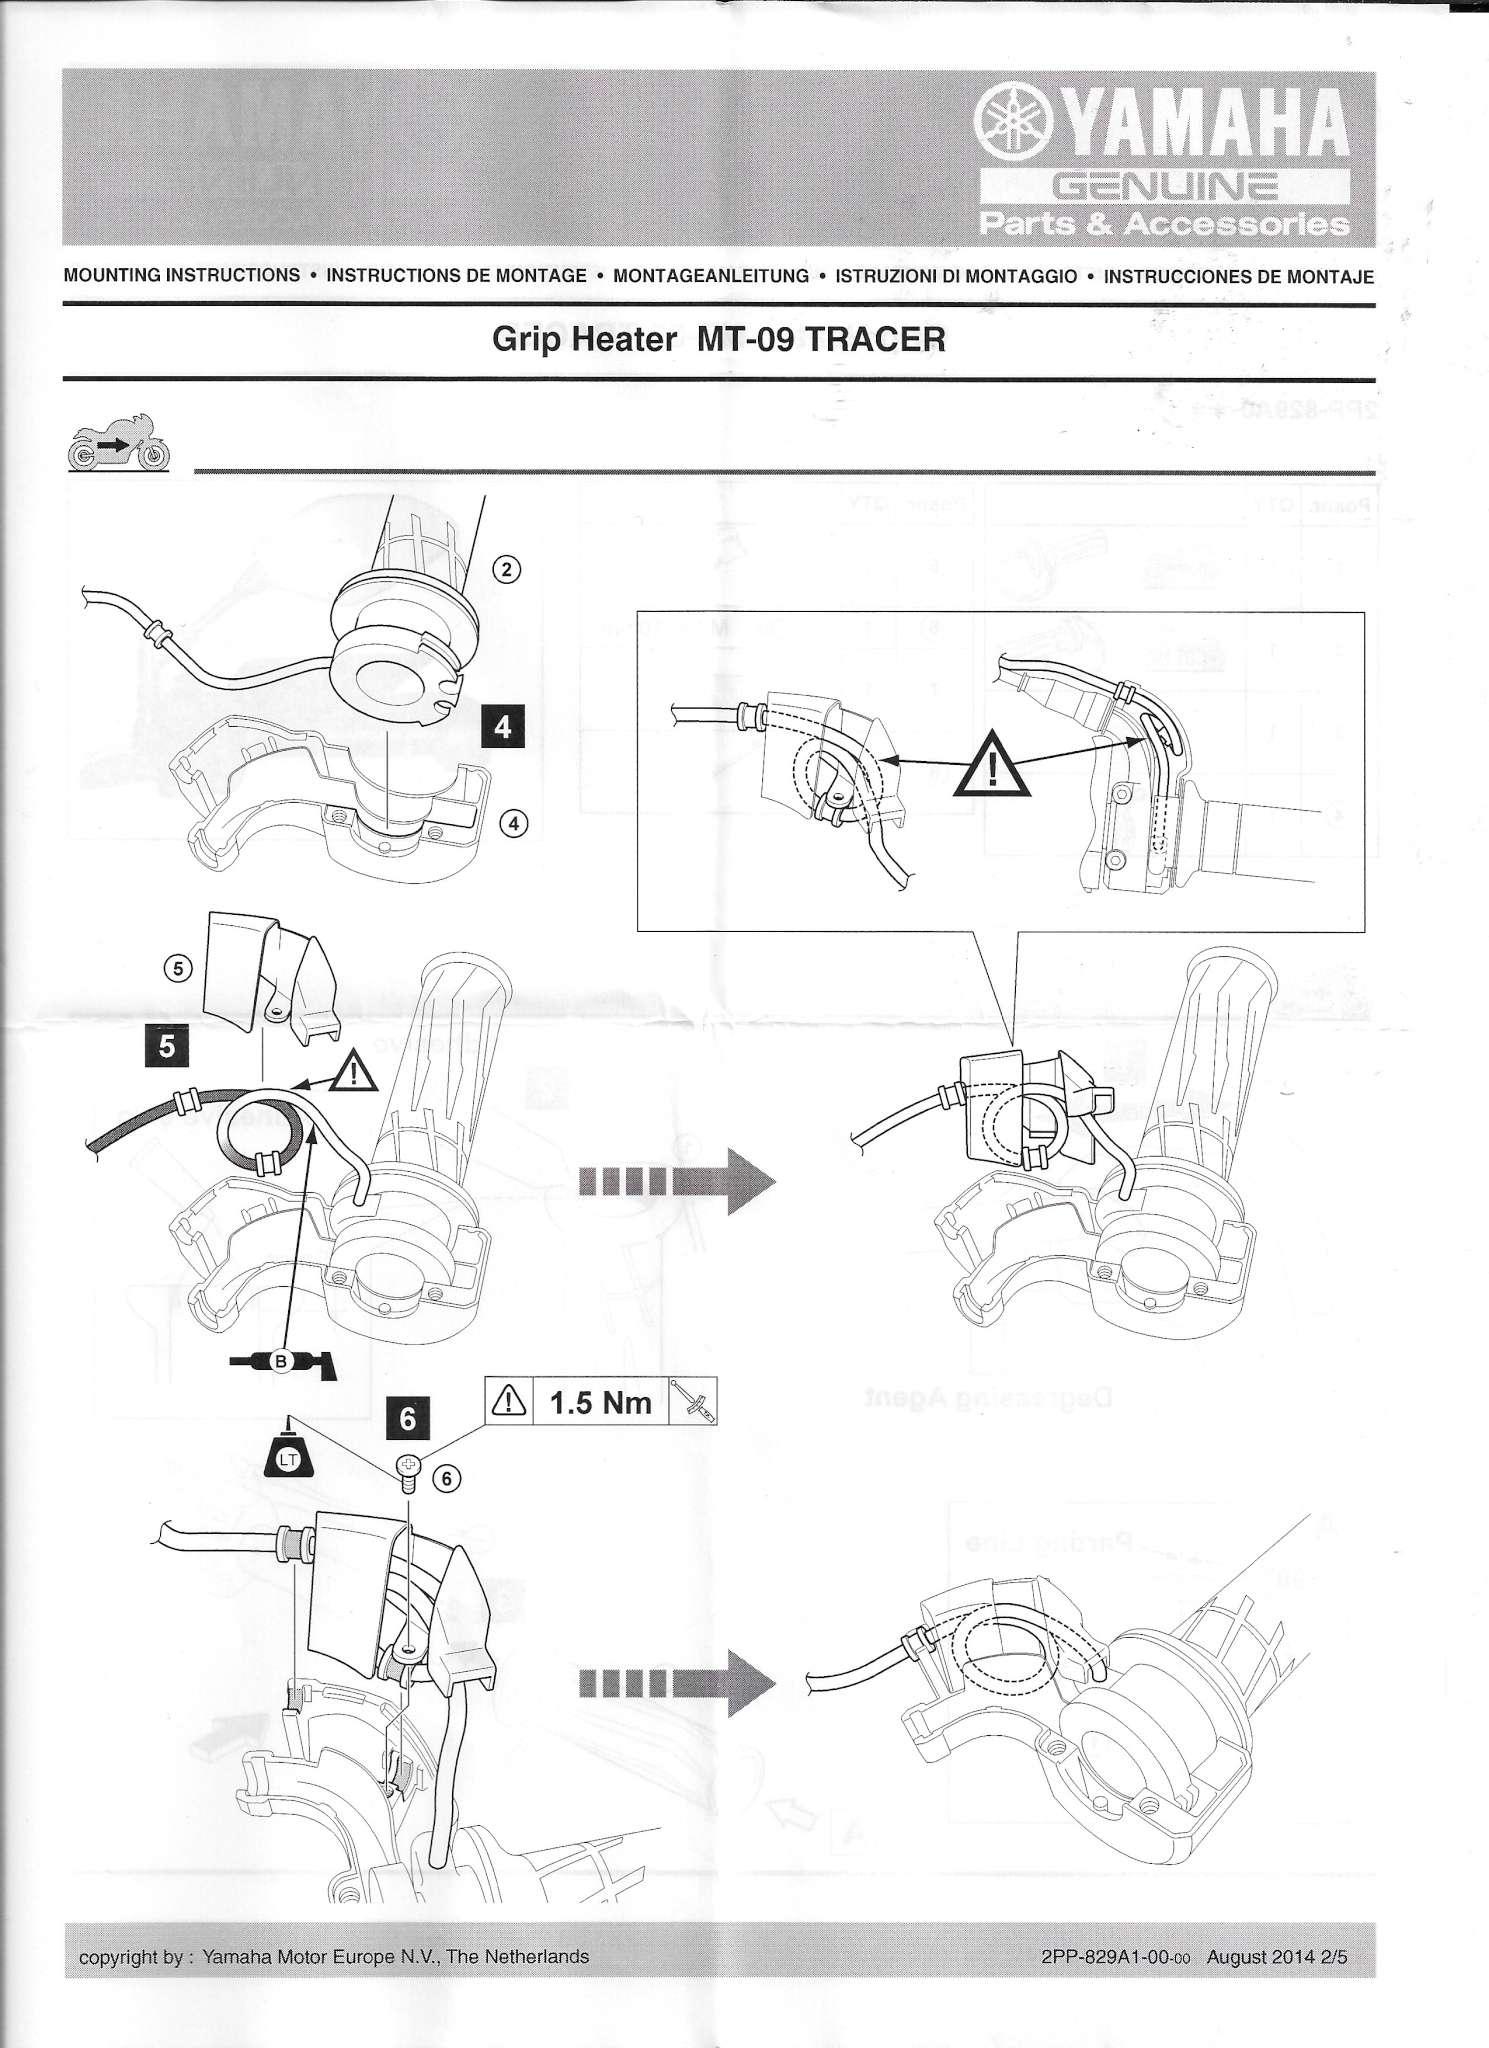 Poignées chauffantes Yamaha Tracer - Page 3 Yamaha11